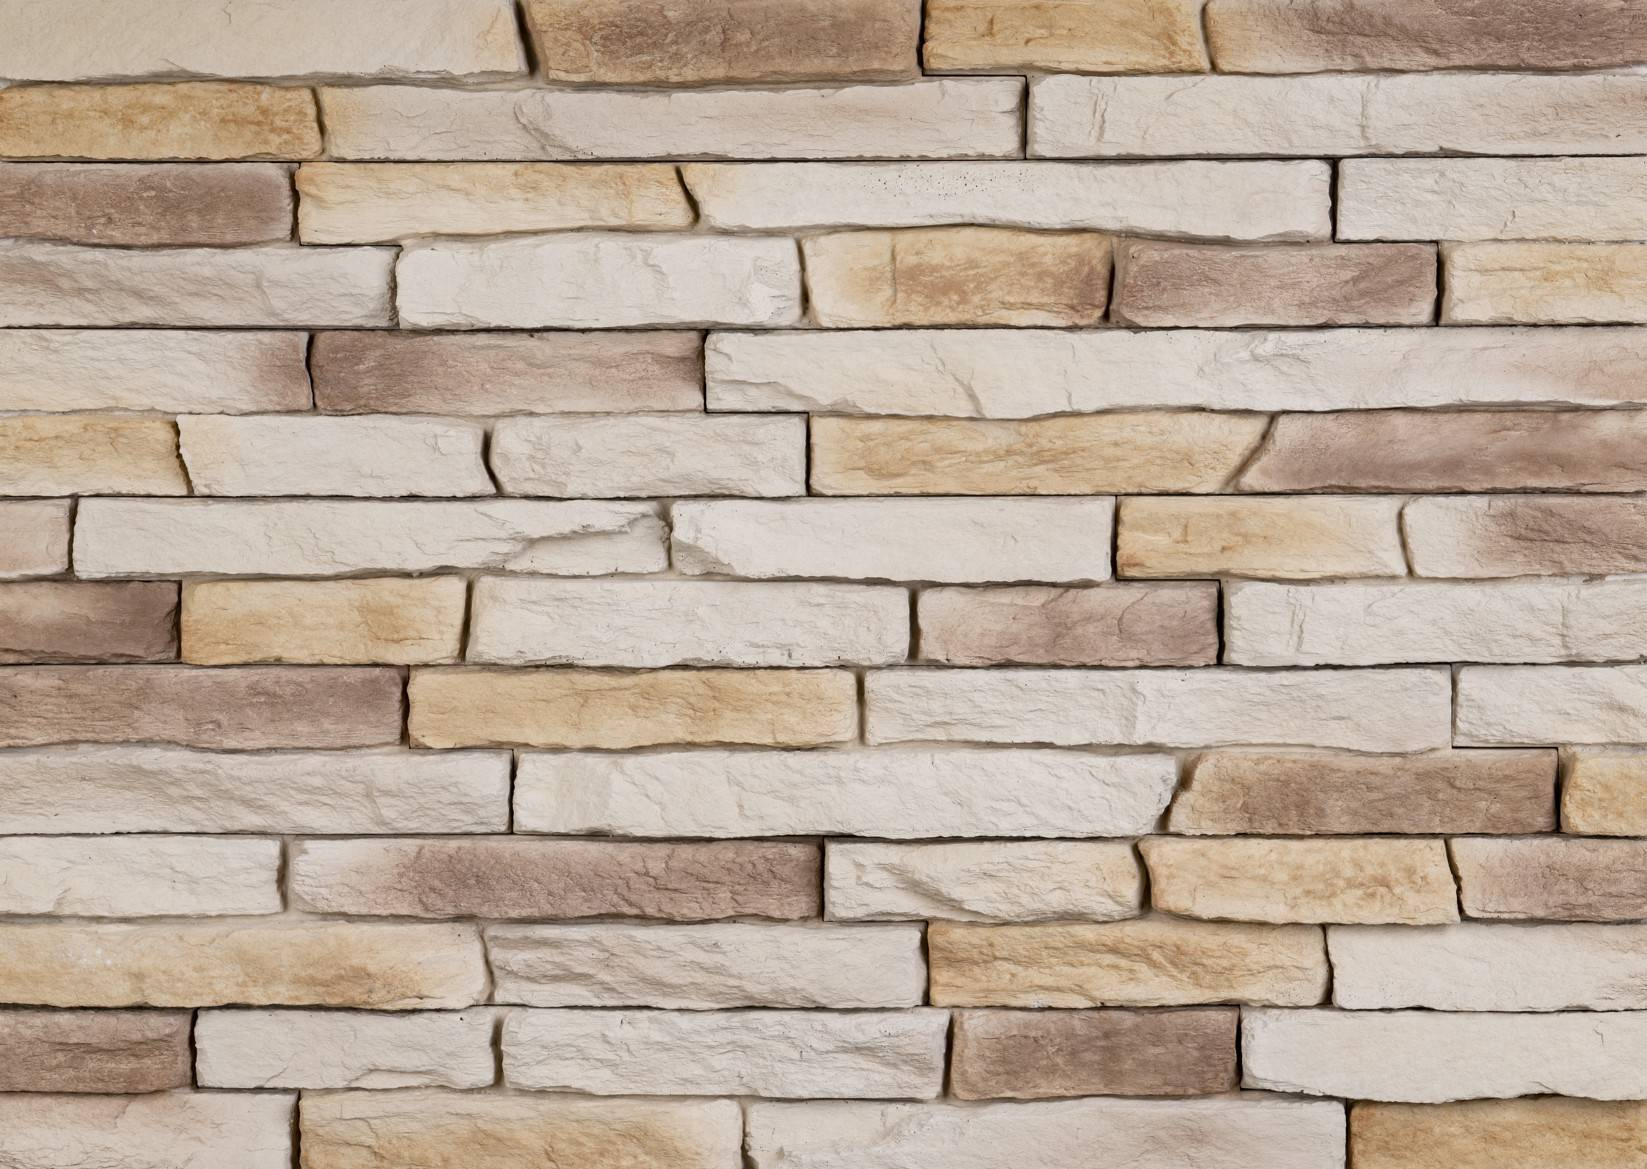 LIPEA - Sierra 2 - BEIGE, betonový obklad imitující kámen/ kamenný obklad z lehčeného betonu www.lipea.cz